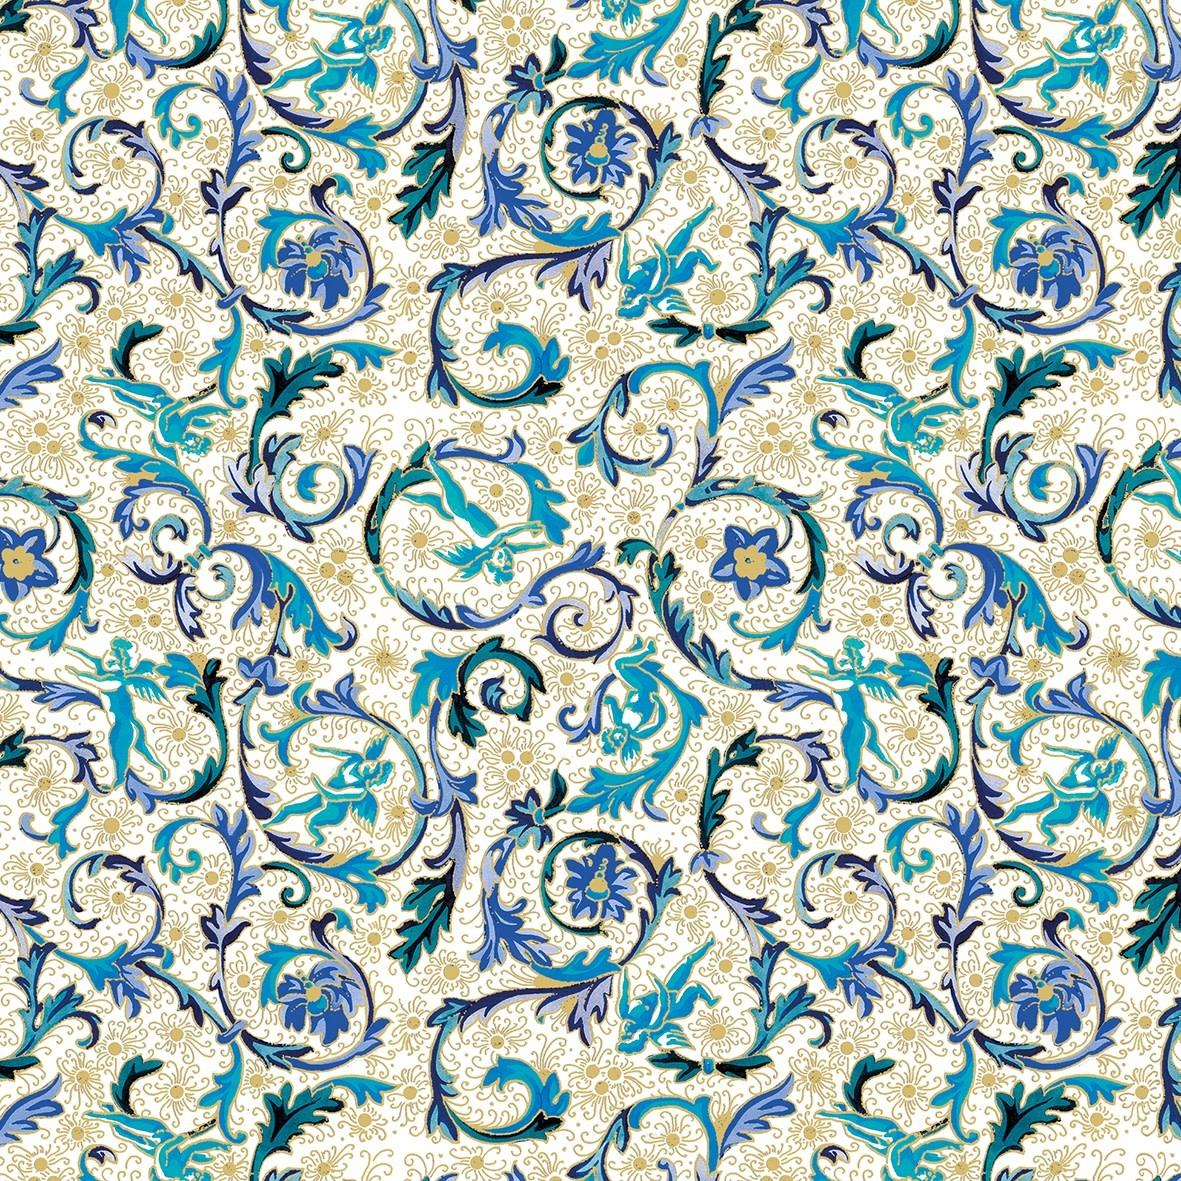 Paperproducts Design Napkin 25x25 cm 'Fiorentina' 20 pcs